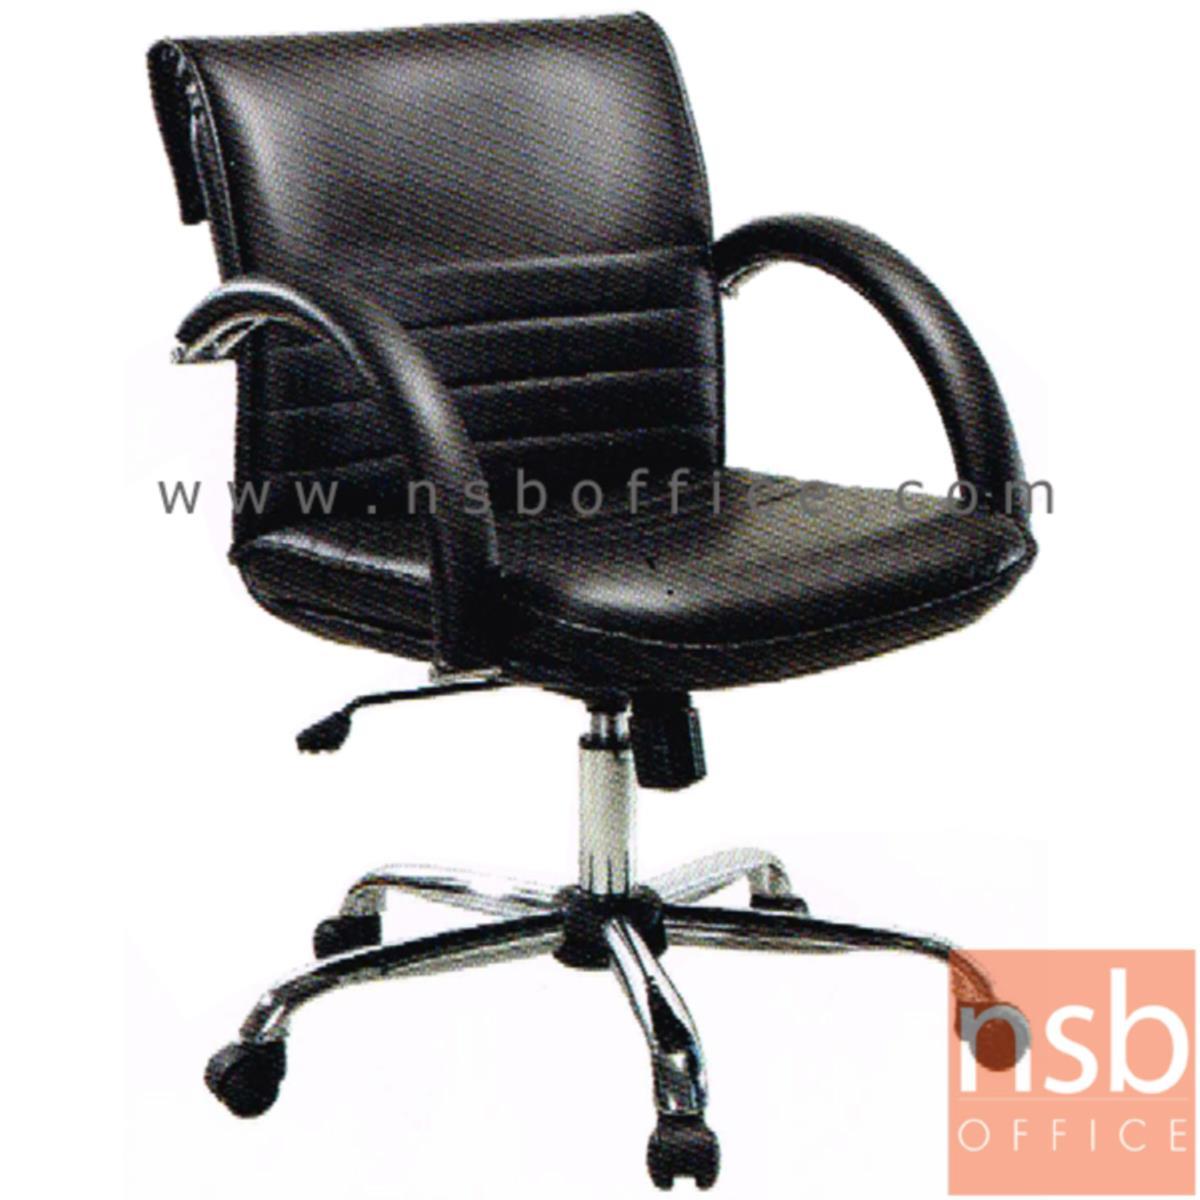 B03A376:เก้าอี้สำนักงาน รุ่น Pinter (พินเทอร์)  โช๊คแก๊ส มีก้อนโยก ขาเหล็กชุบโครเมี่ยม